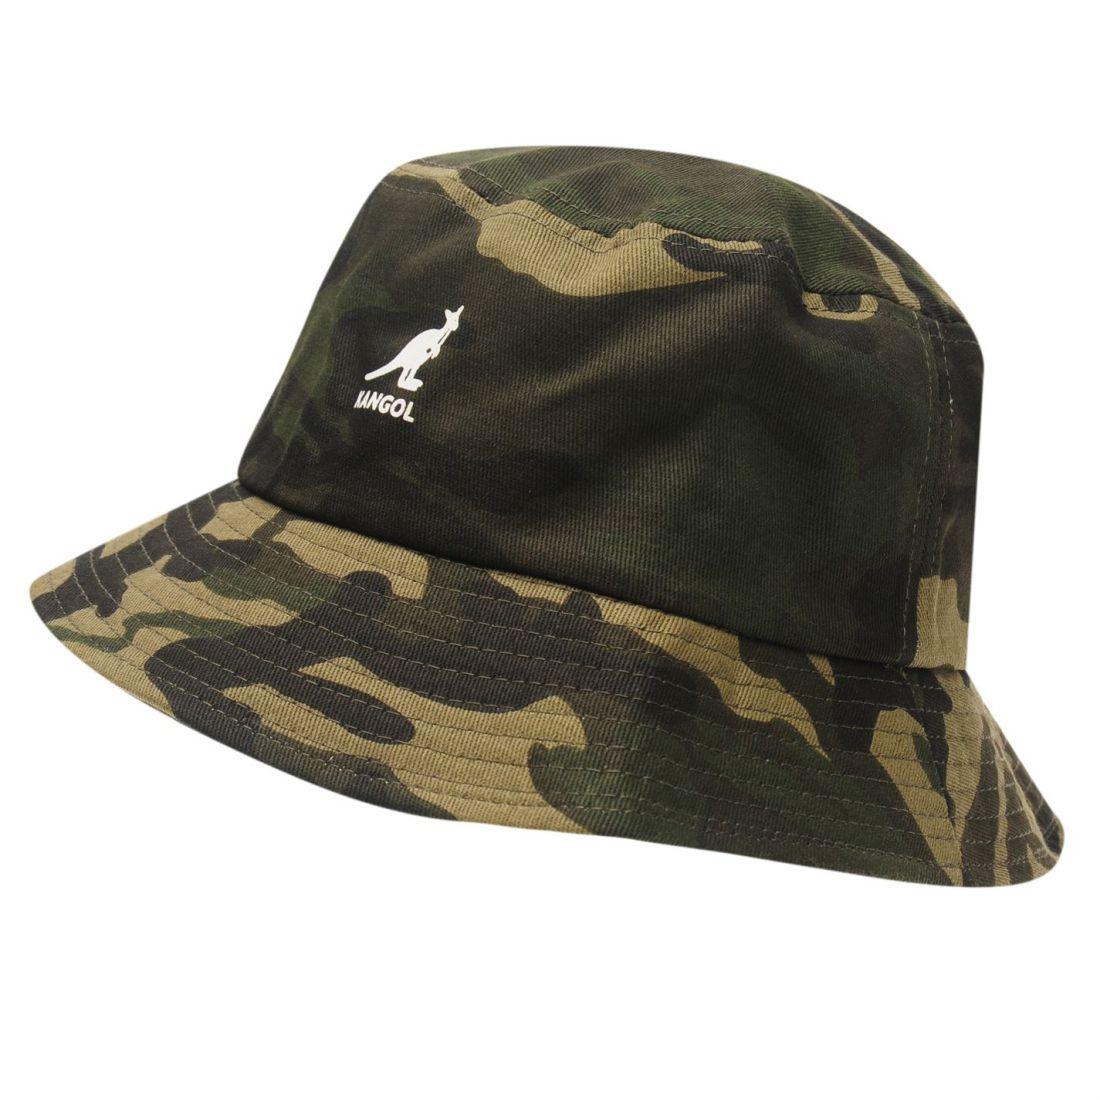 261e0b01679 Details about Kangol Mens Camouflage Bucket Hat Cotton Pattern